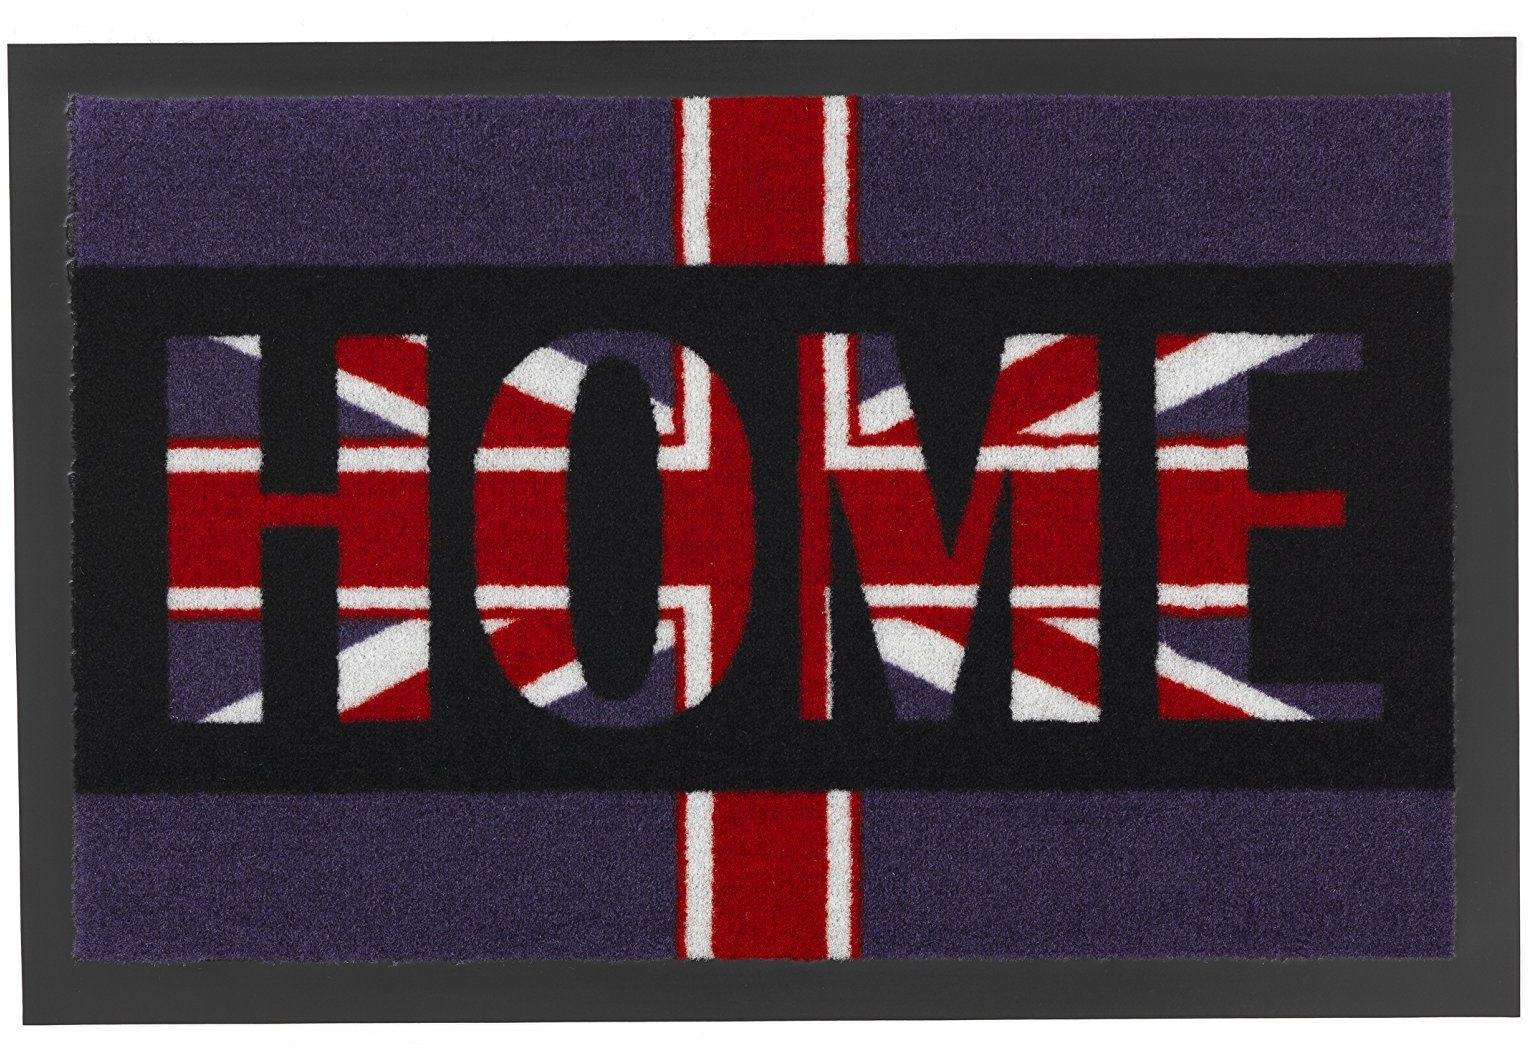 ASTRA 1672015003 Mata, Wycieraczka, Flag Design Home, 39 x 58 cm, liliowa